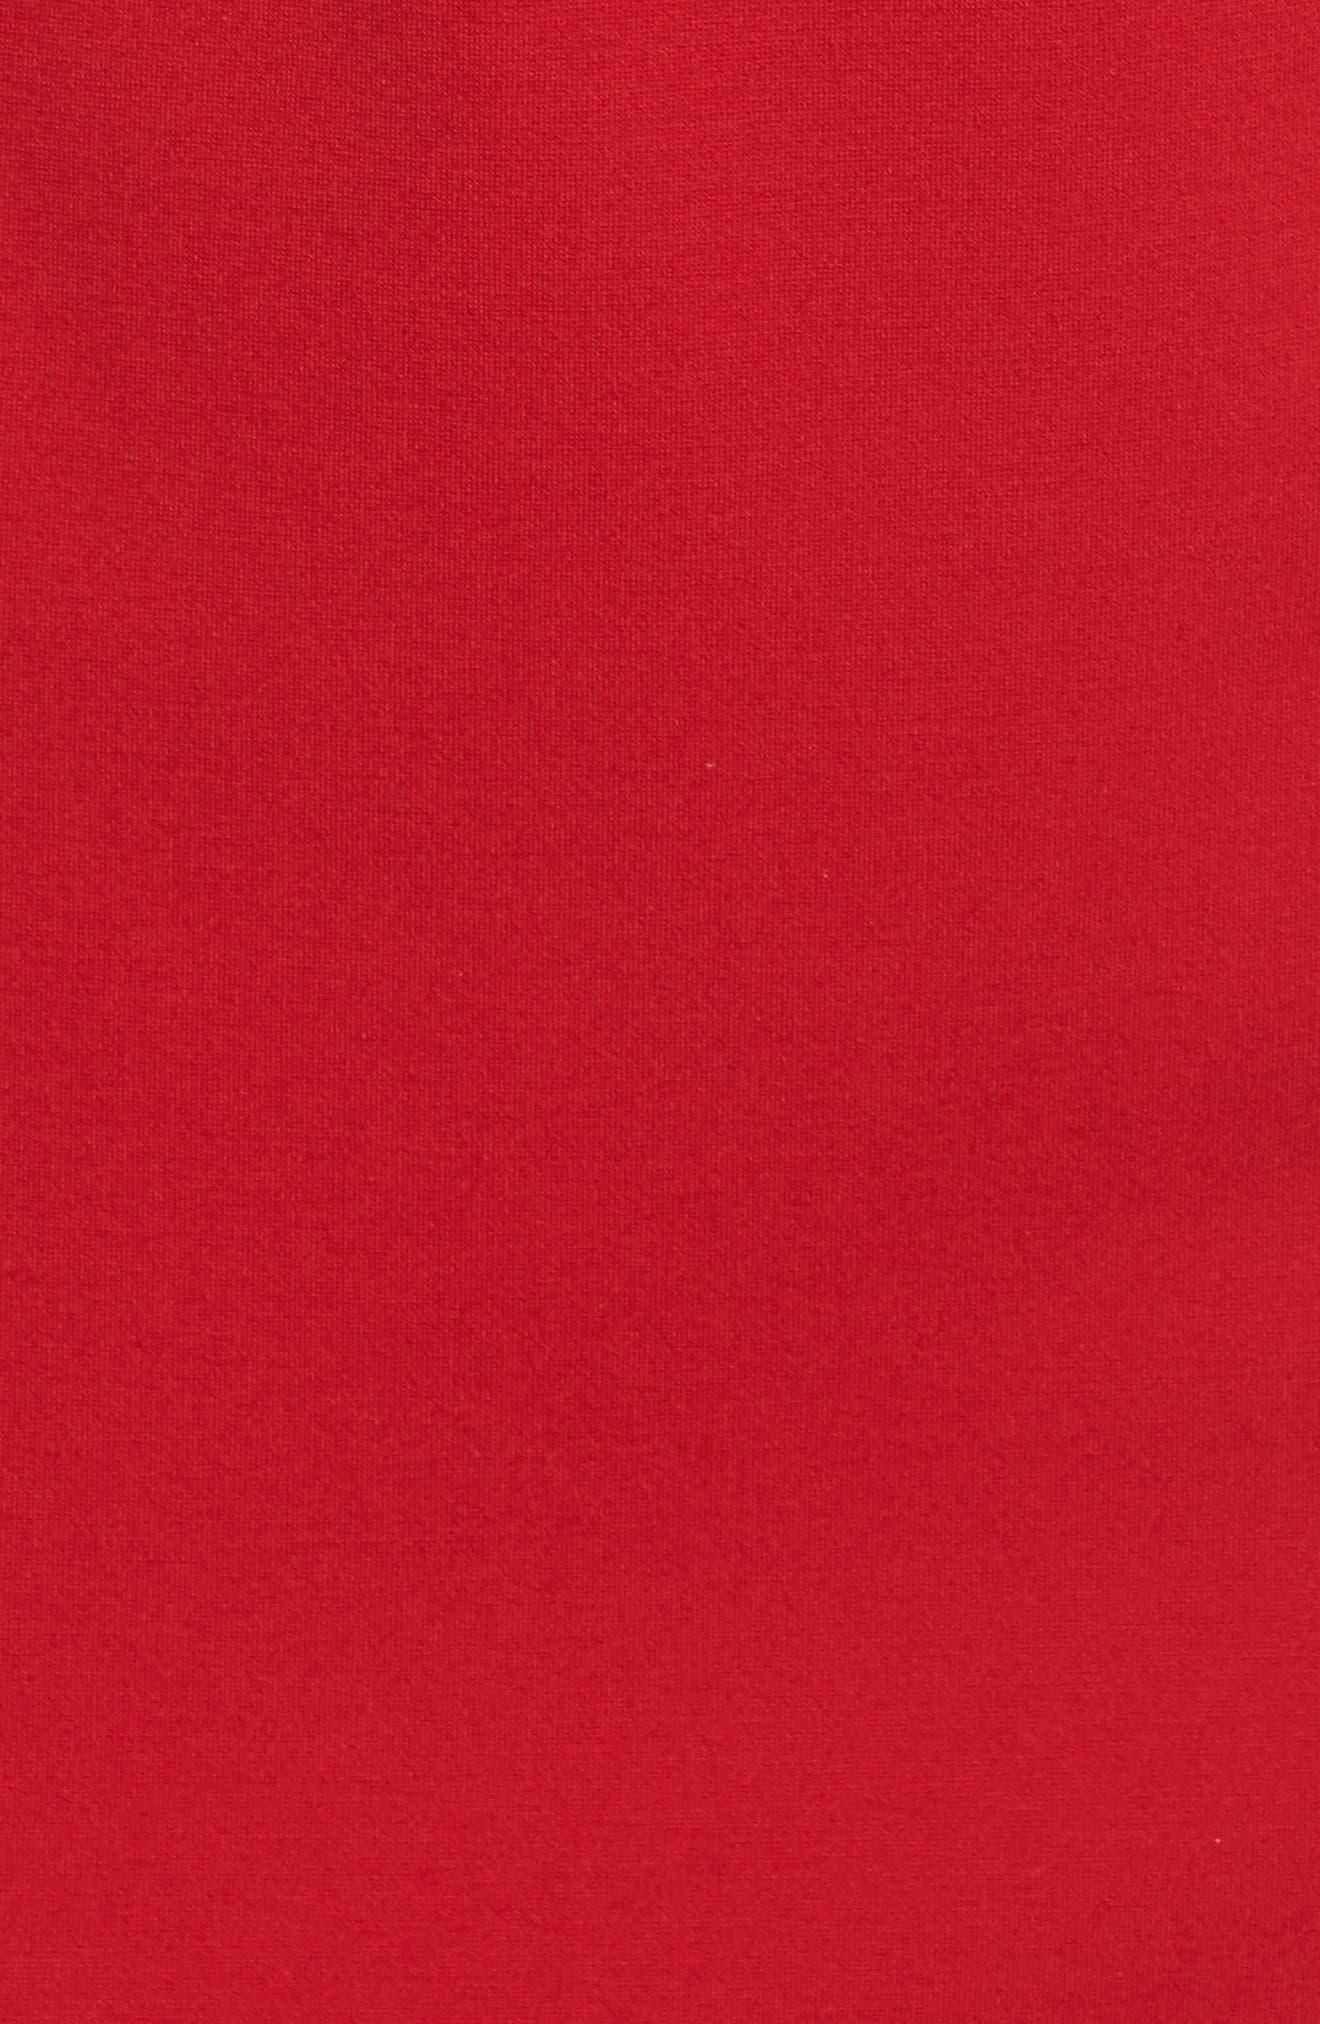 Velvet Trim Crepe Sheath Dress,                             Alternate thumbnail 5, color,